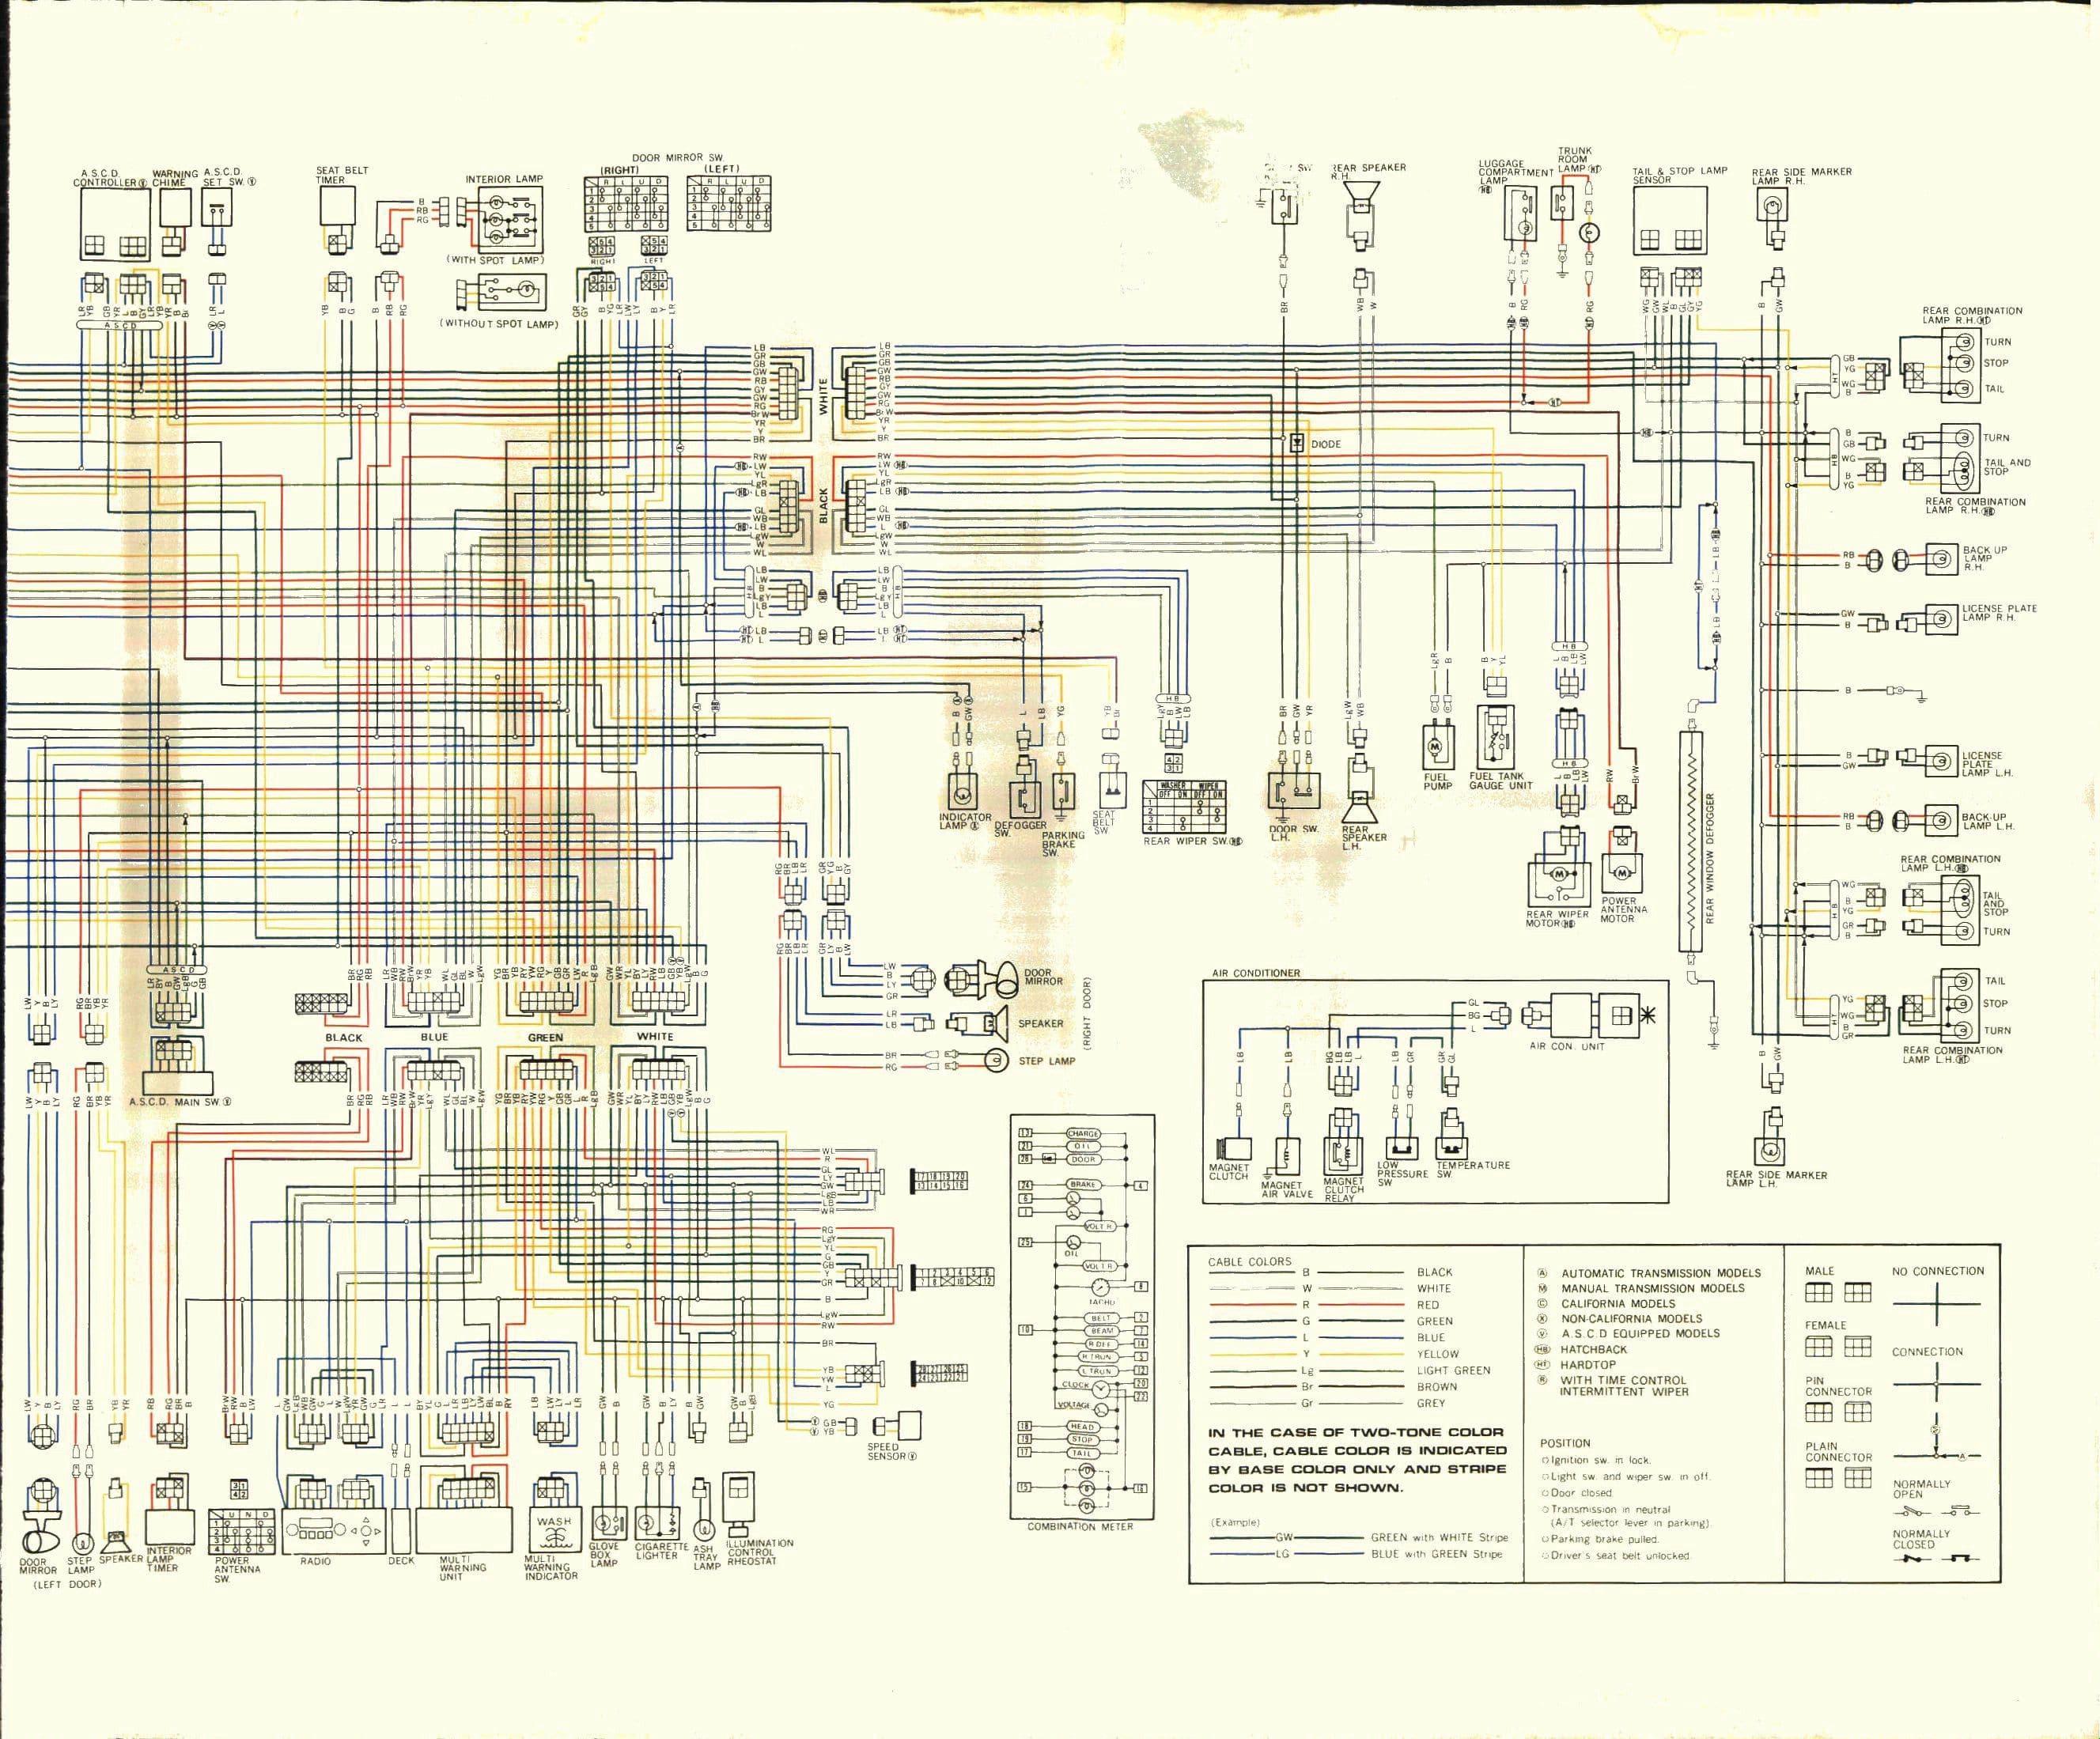 Nissan Datsun 200SX (1980) - wire diagram (page 2)